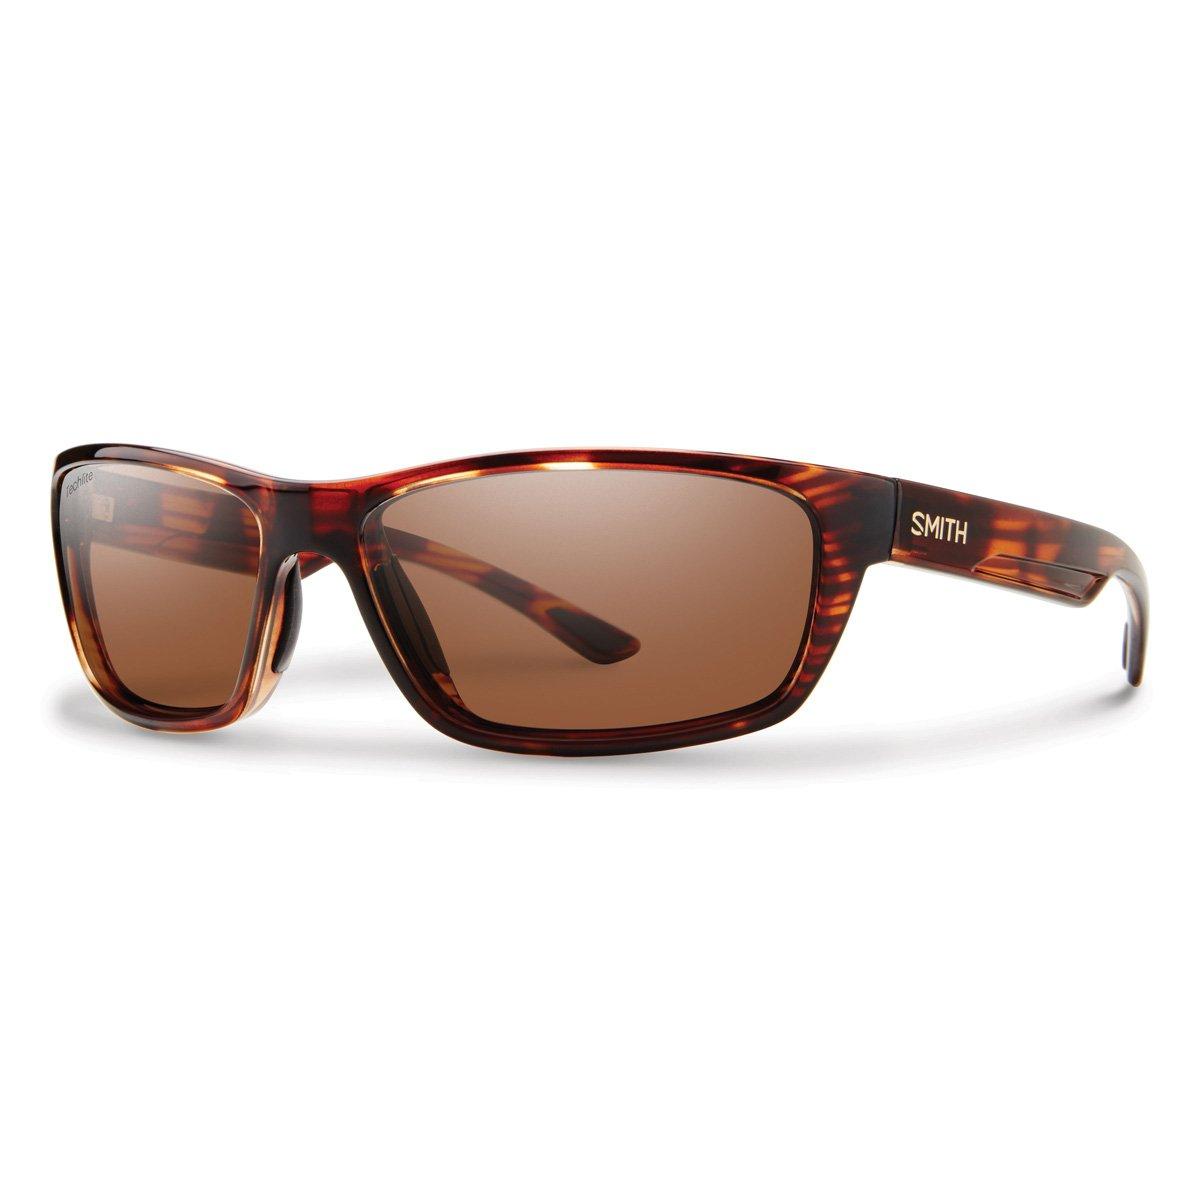 Smith Optics Ridgewell Sunglasses